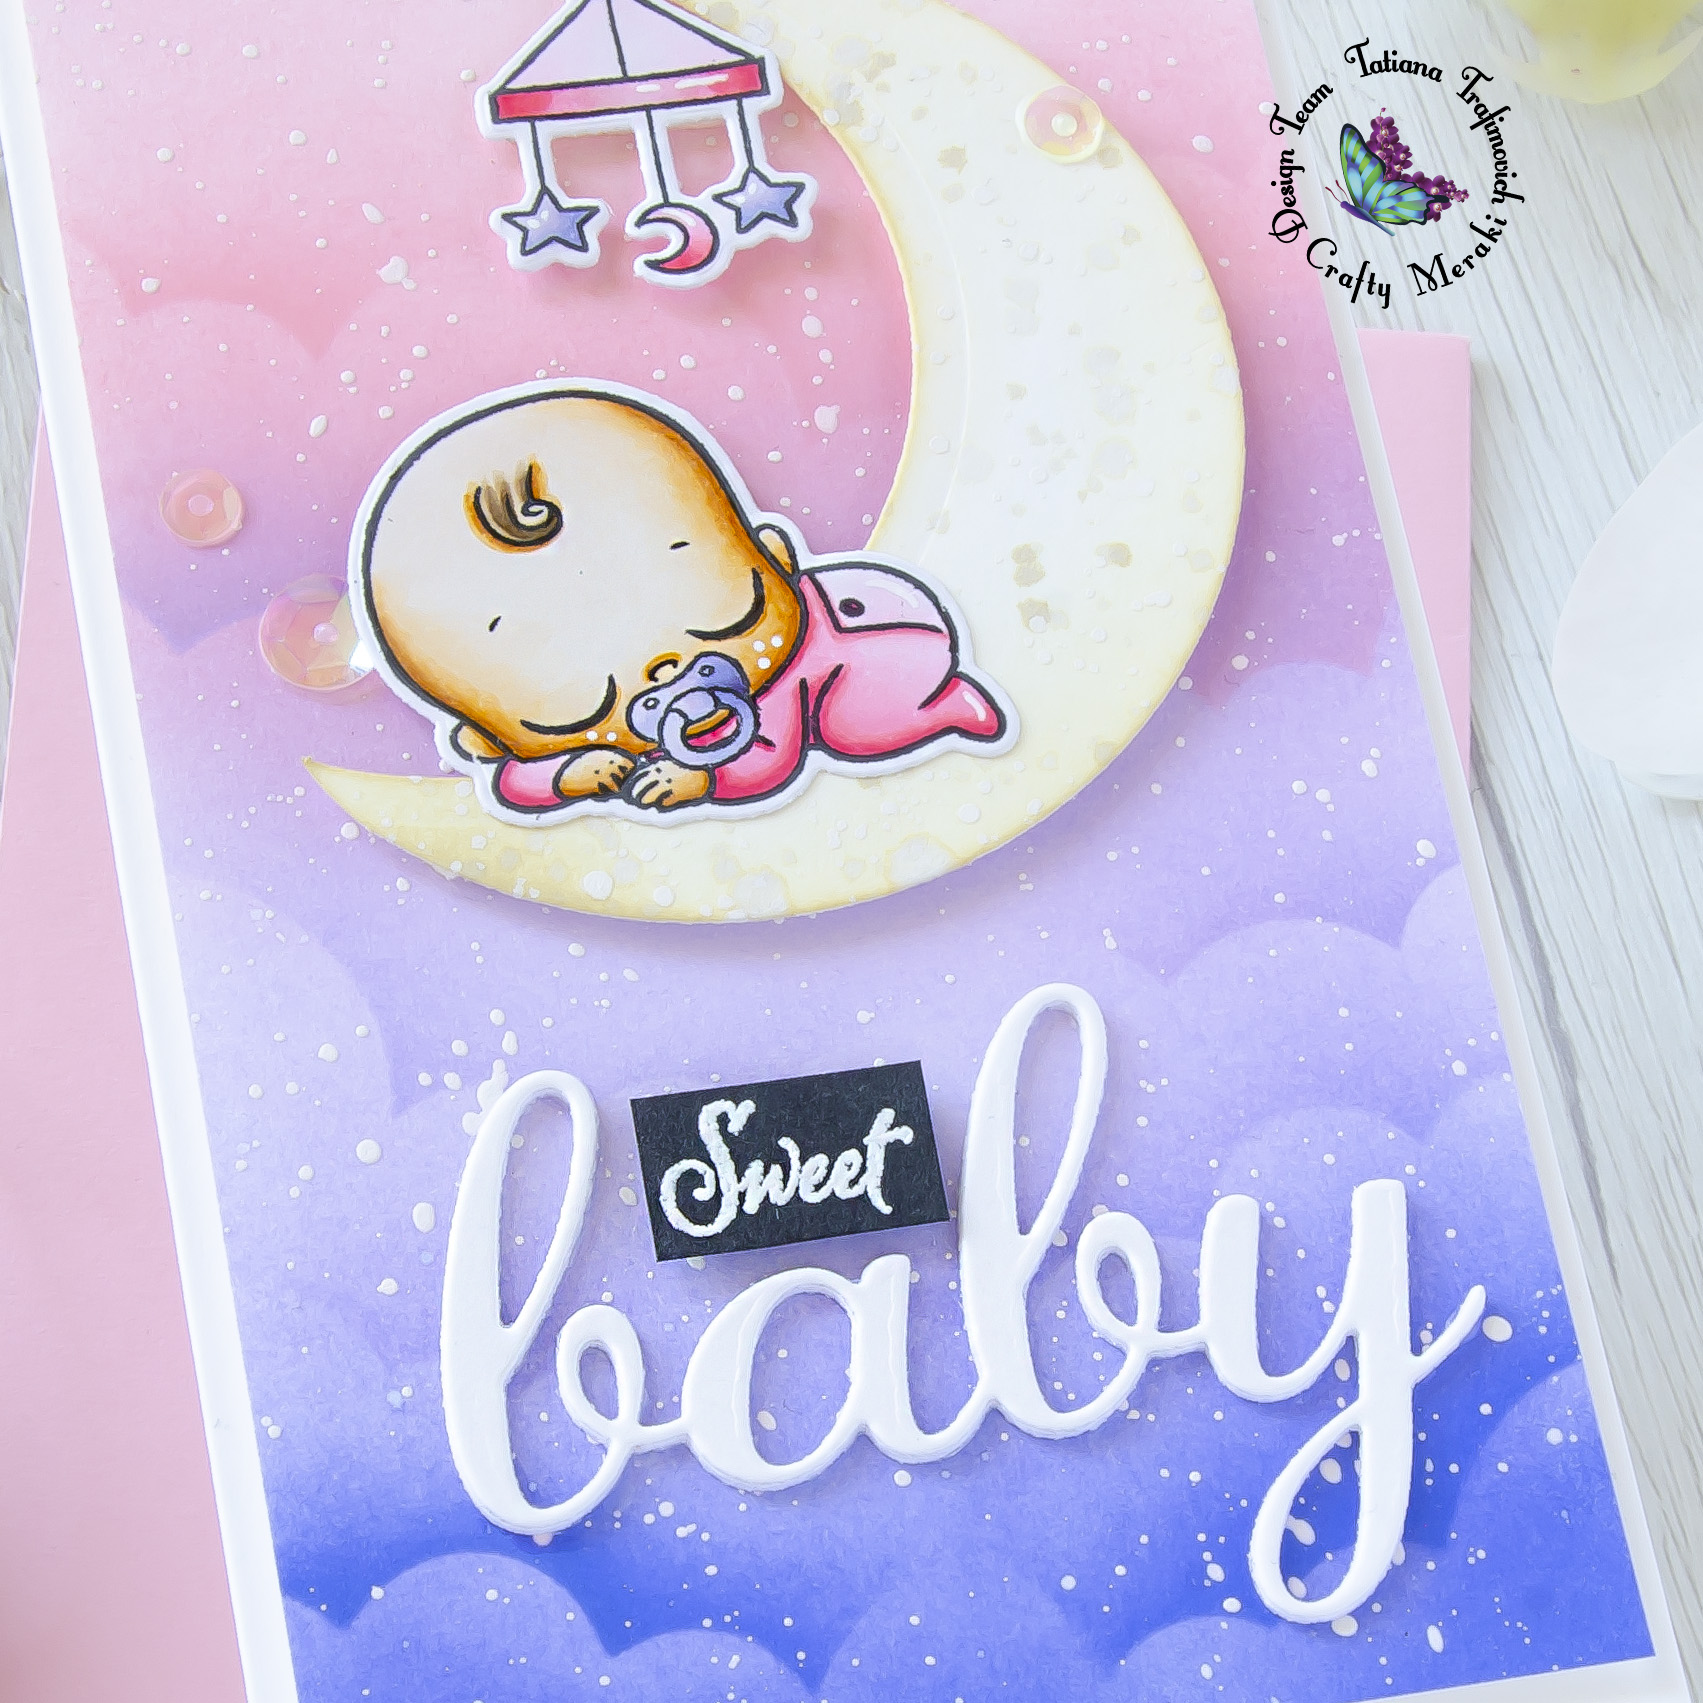 Sweet Baby #handmade card by Tatiana Trafimovich #tatianacraftandart - Oh Baby stamp set by Crafty Meraki #craftymeraki